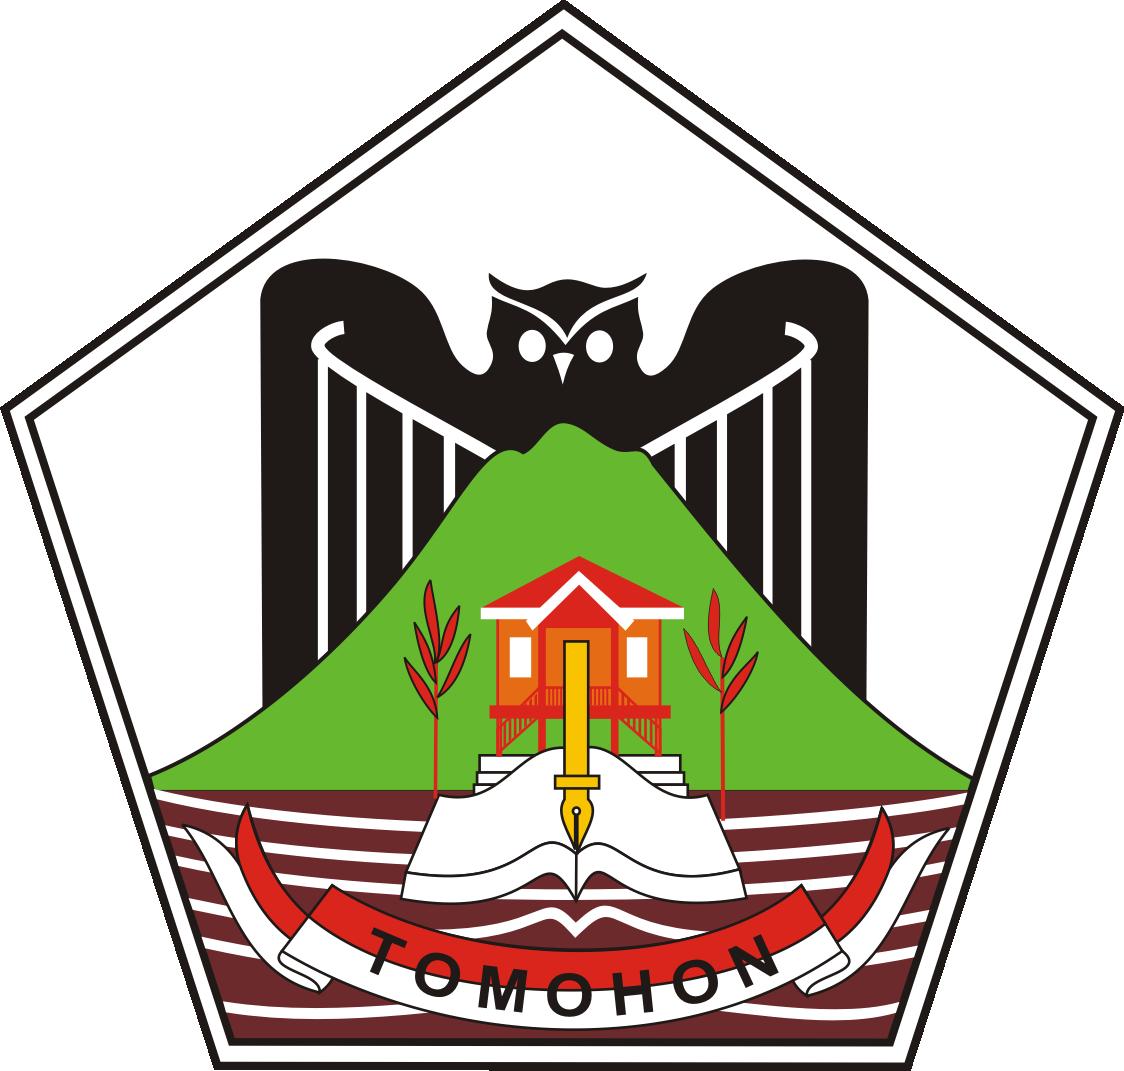 Kota Tomohon Kota Indonesia